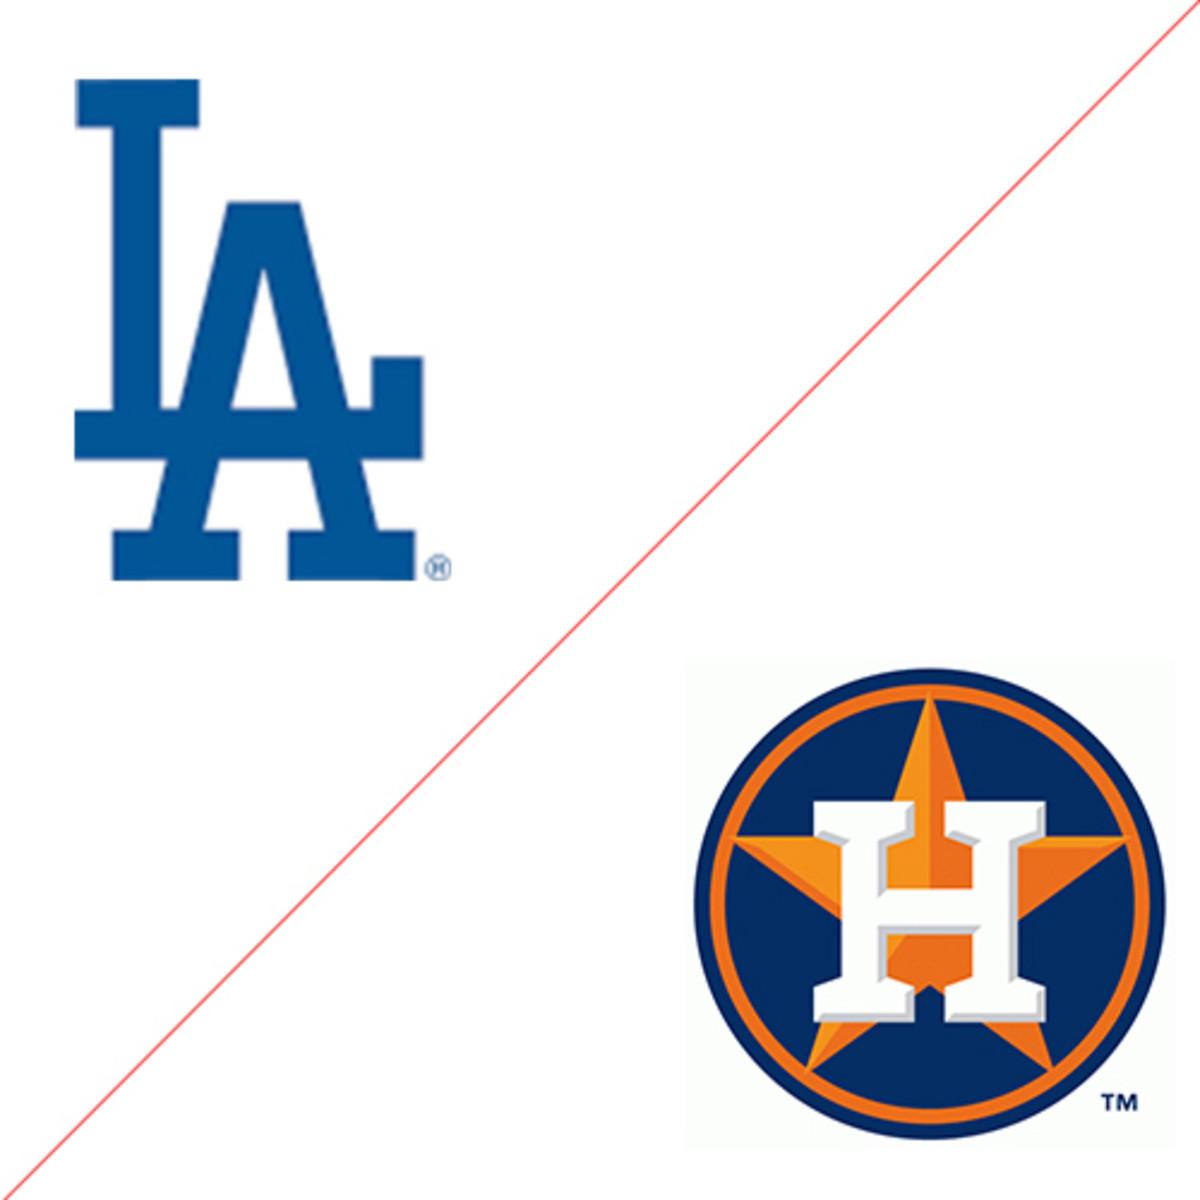 World Series: Dodgers, Astros (How To Watch Online, TV, Radio)